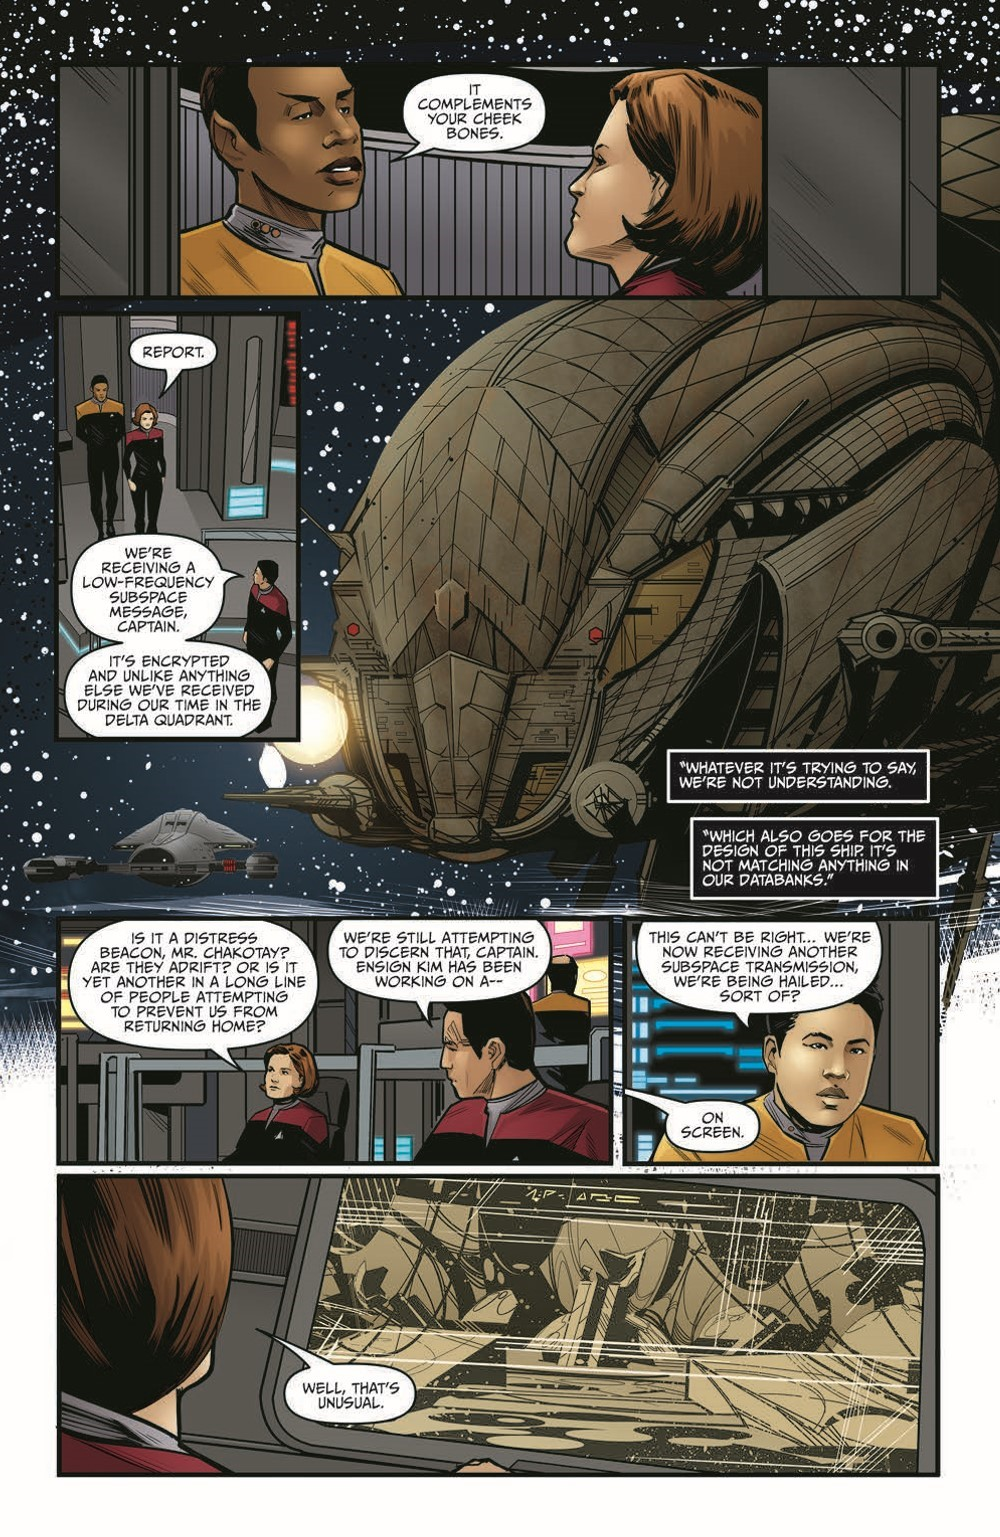 STV_SevensRekoning_TPB_pr-8 ComicList Previews: STAR TREK VOYAGER SEVEN'S RECKONING TP